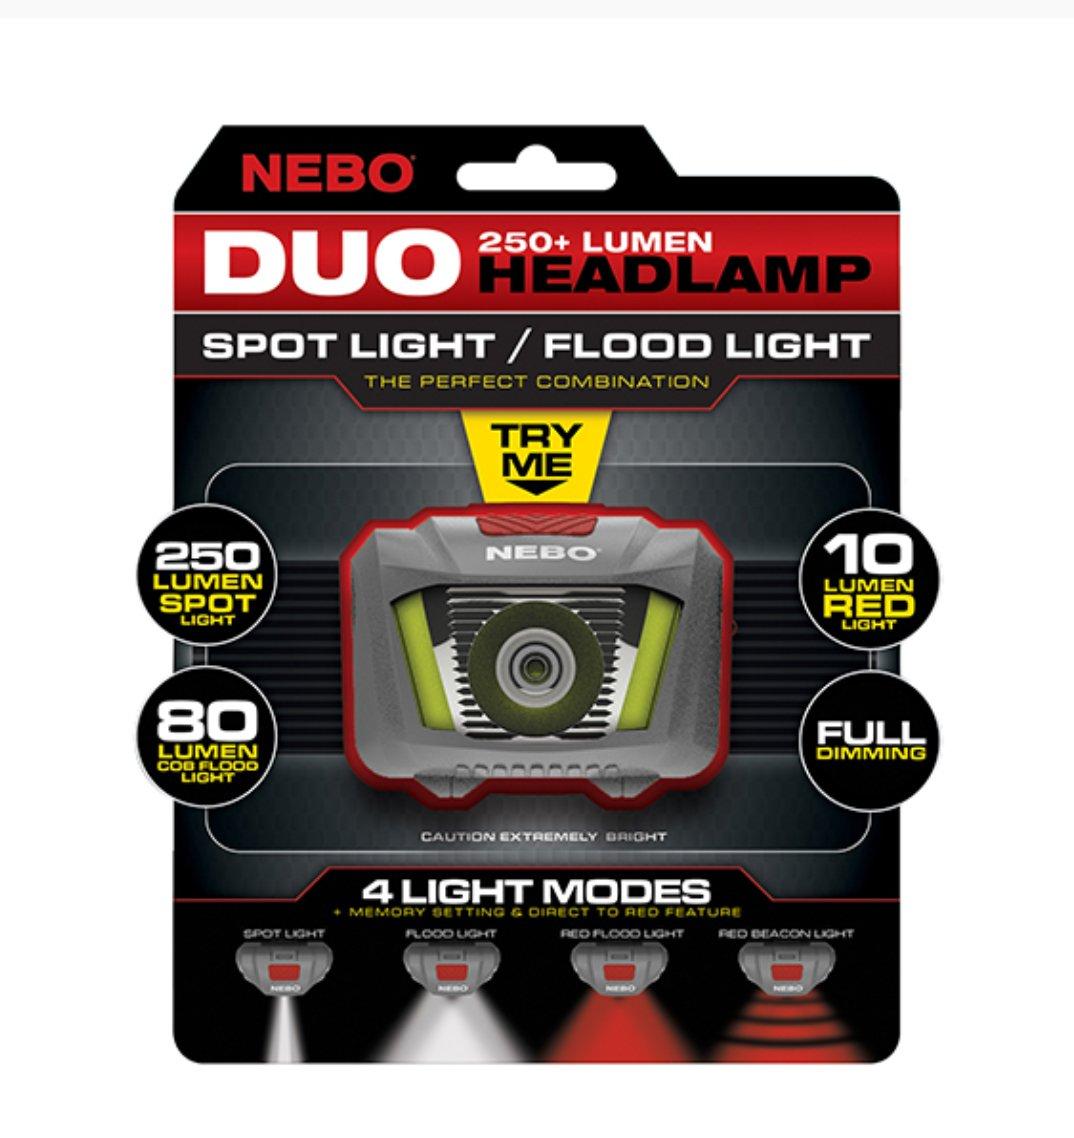 DUO 250 Lyman headlamp by NEBO